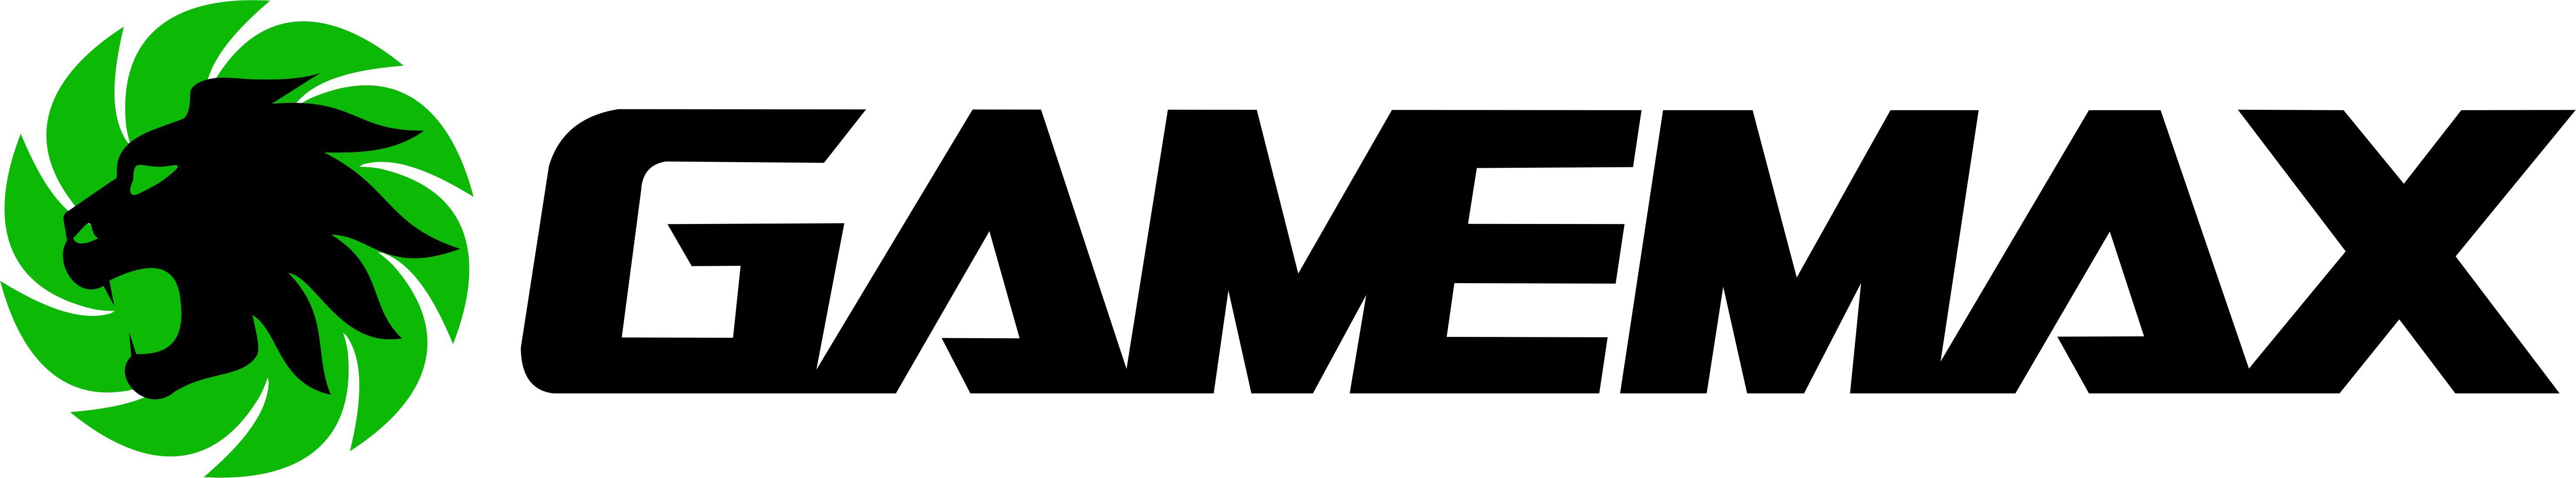 Image result for gamemax logo